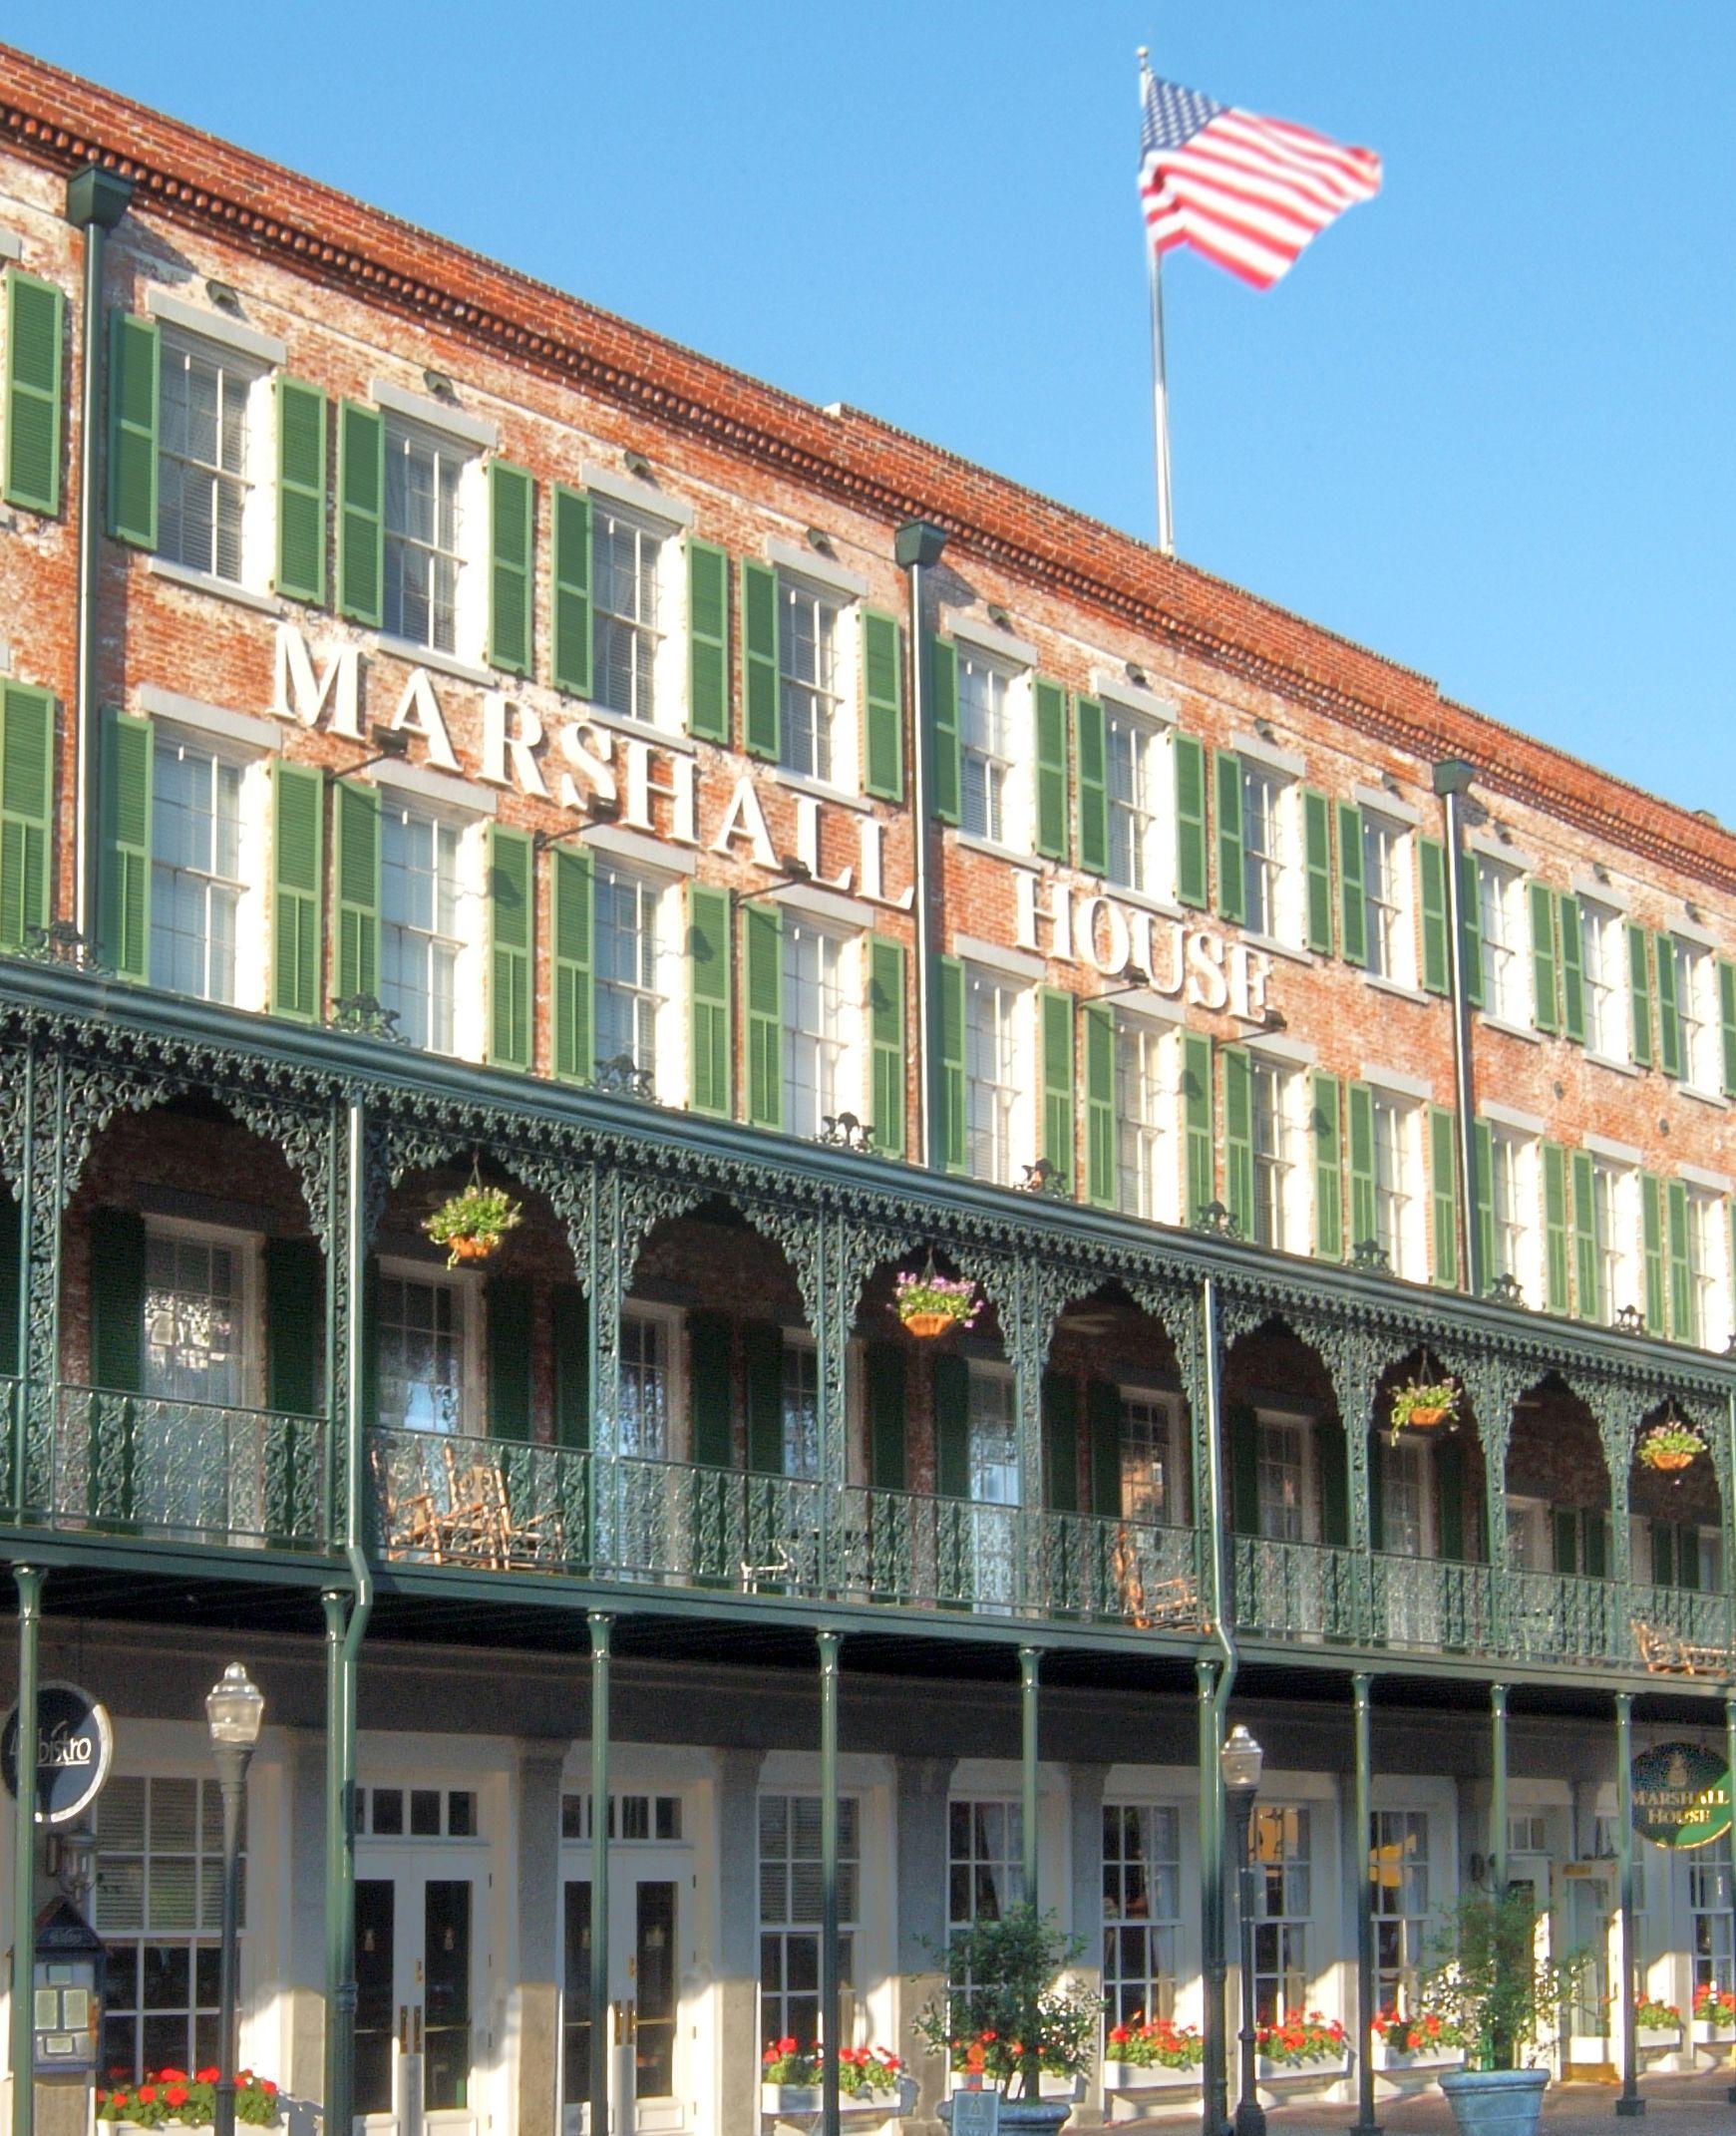 The Marshall House In Savannah Georgia Fabulous And Haunted Savannah Chat Downtown Savannah Savannah Hotels